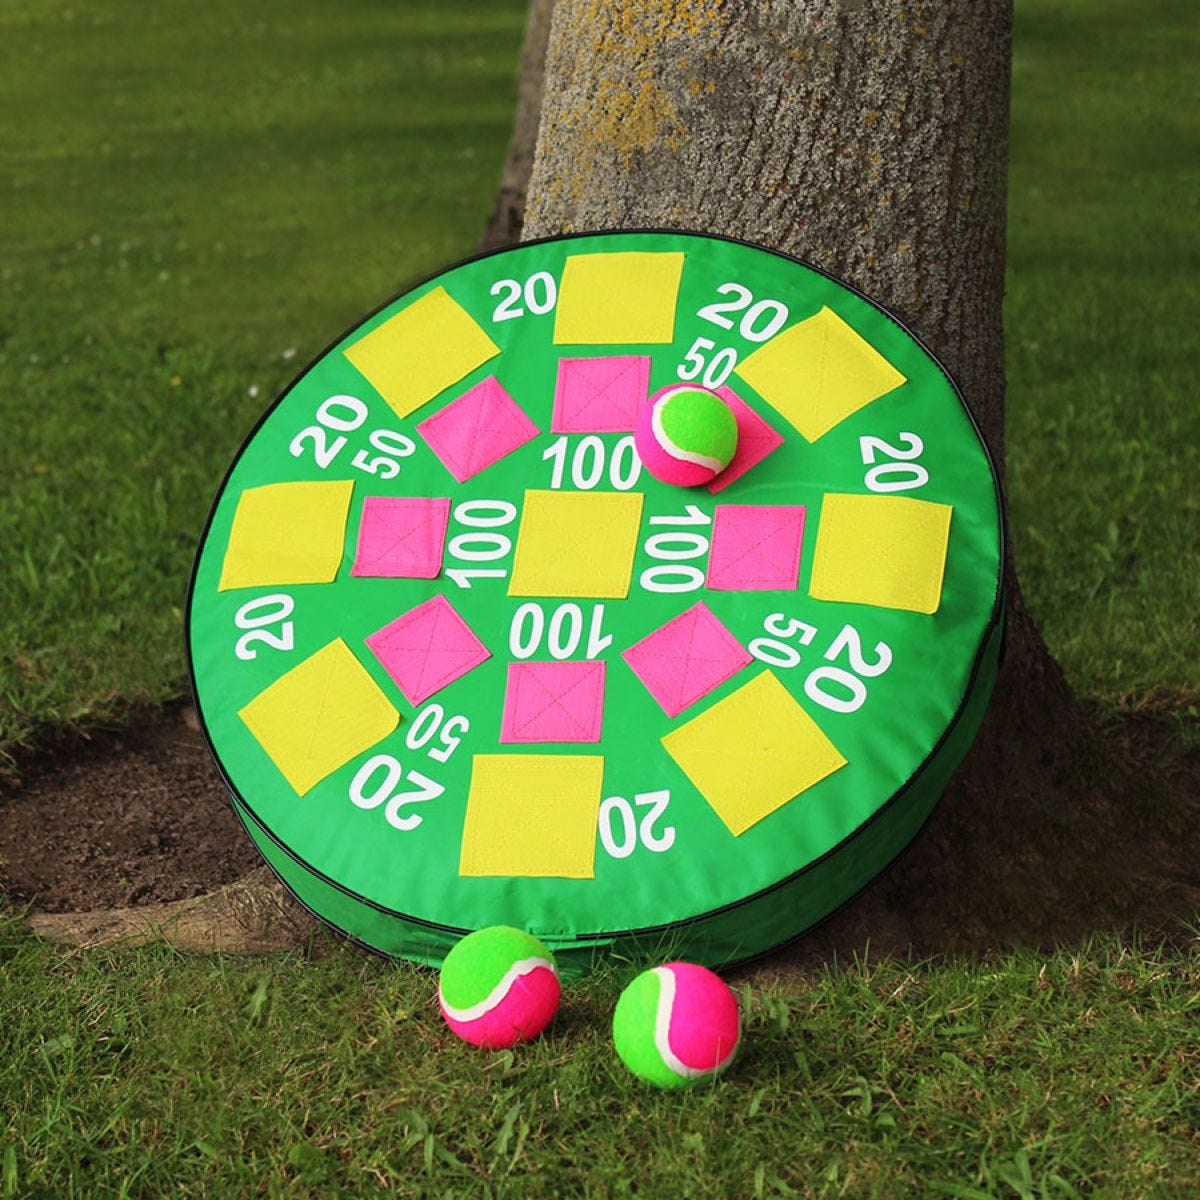 Kingfisher Inflatable Garden Target Game